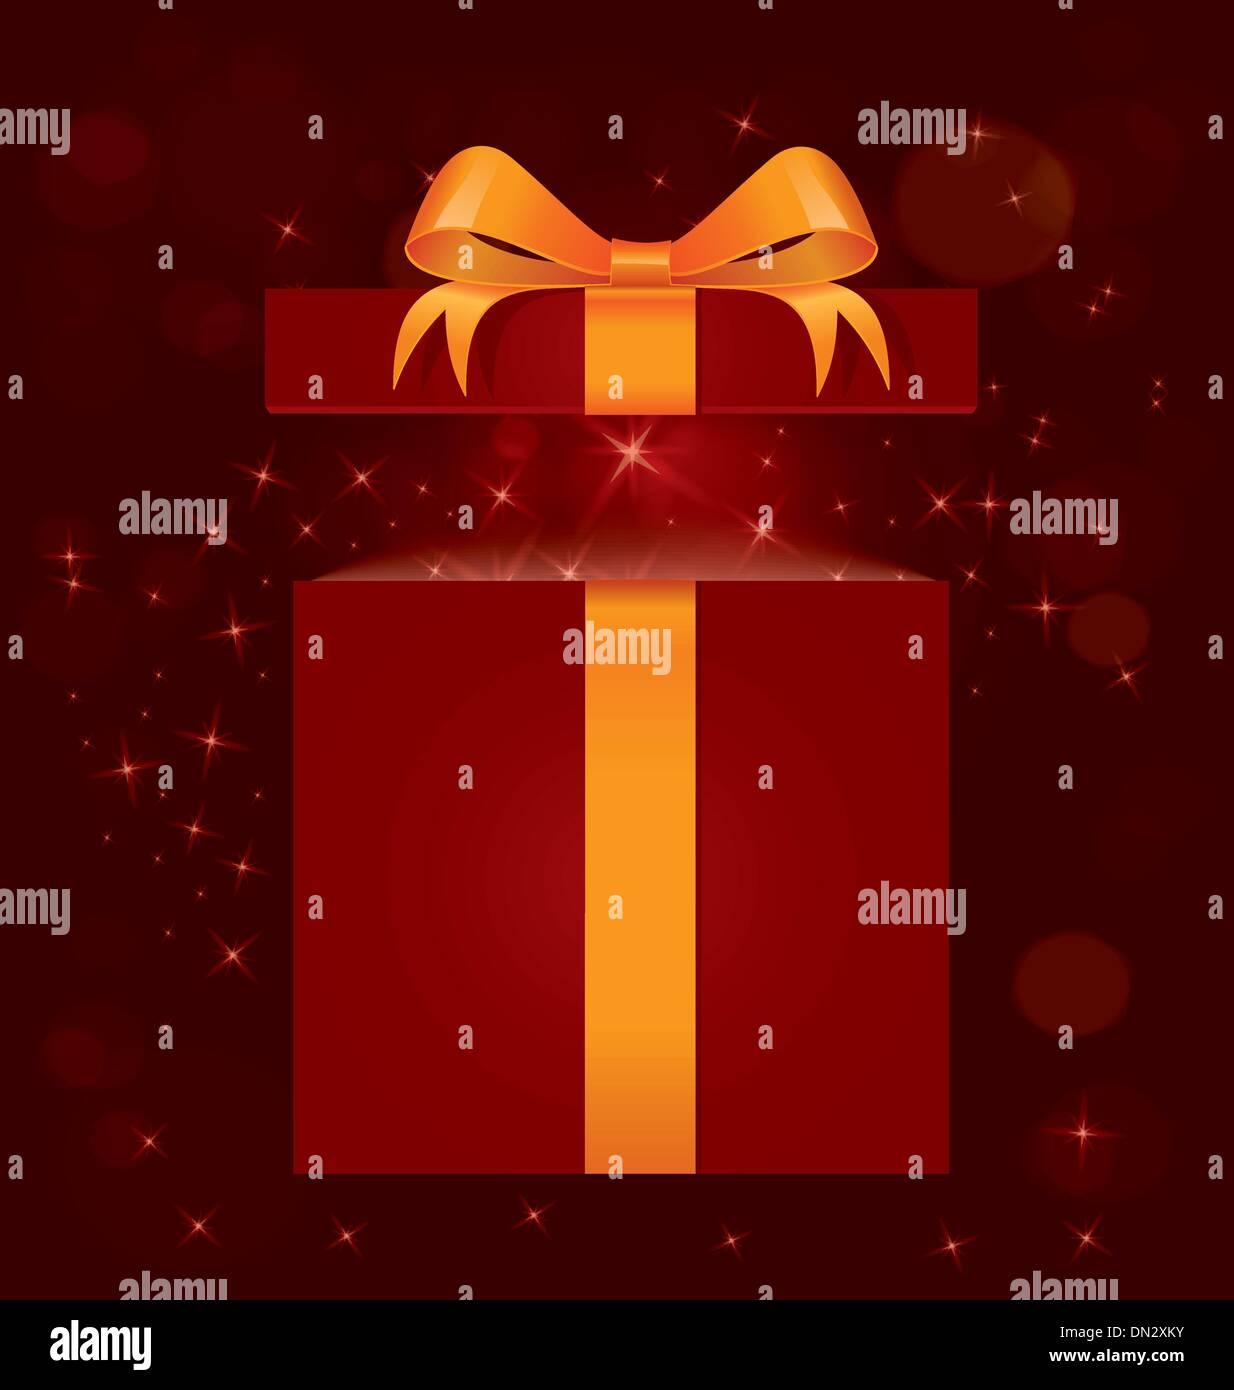 Magic light gift box vector - Stock Image